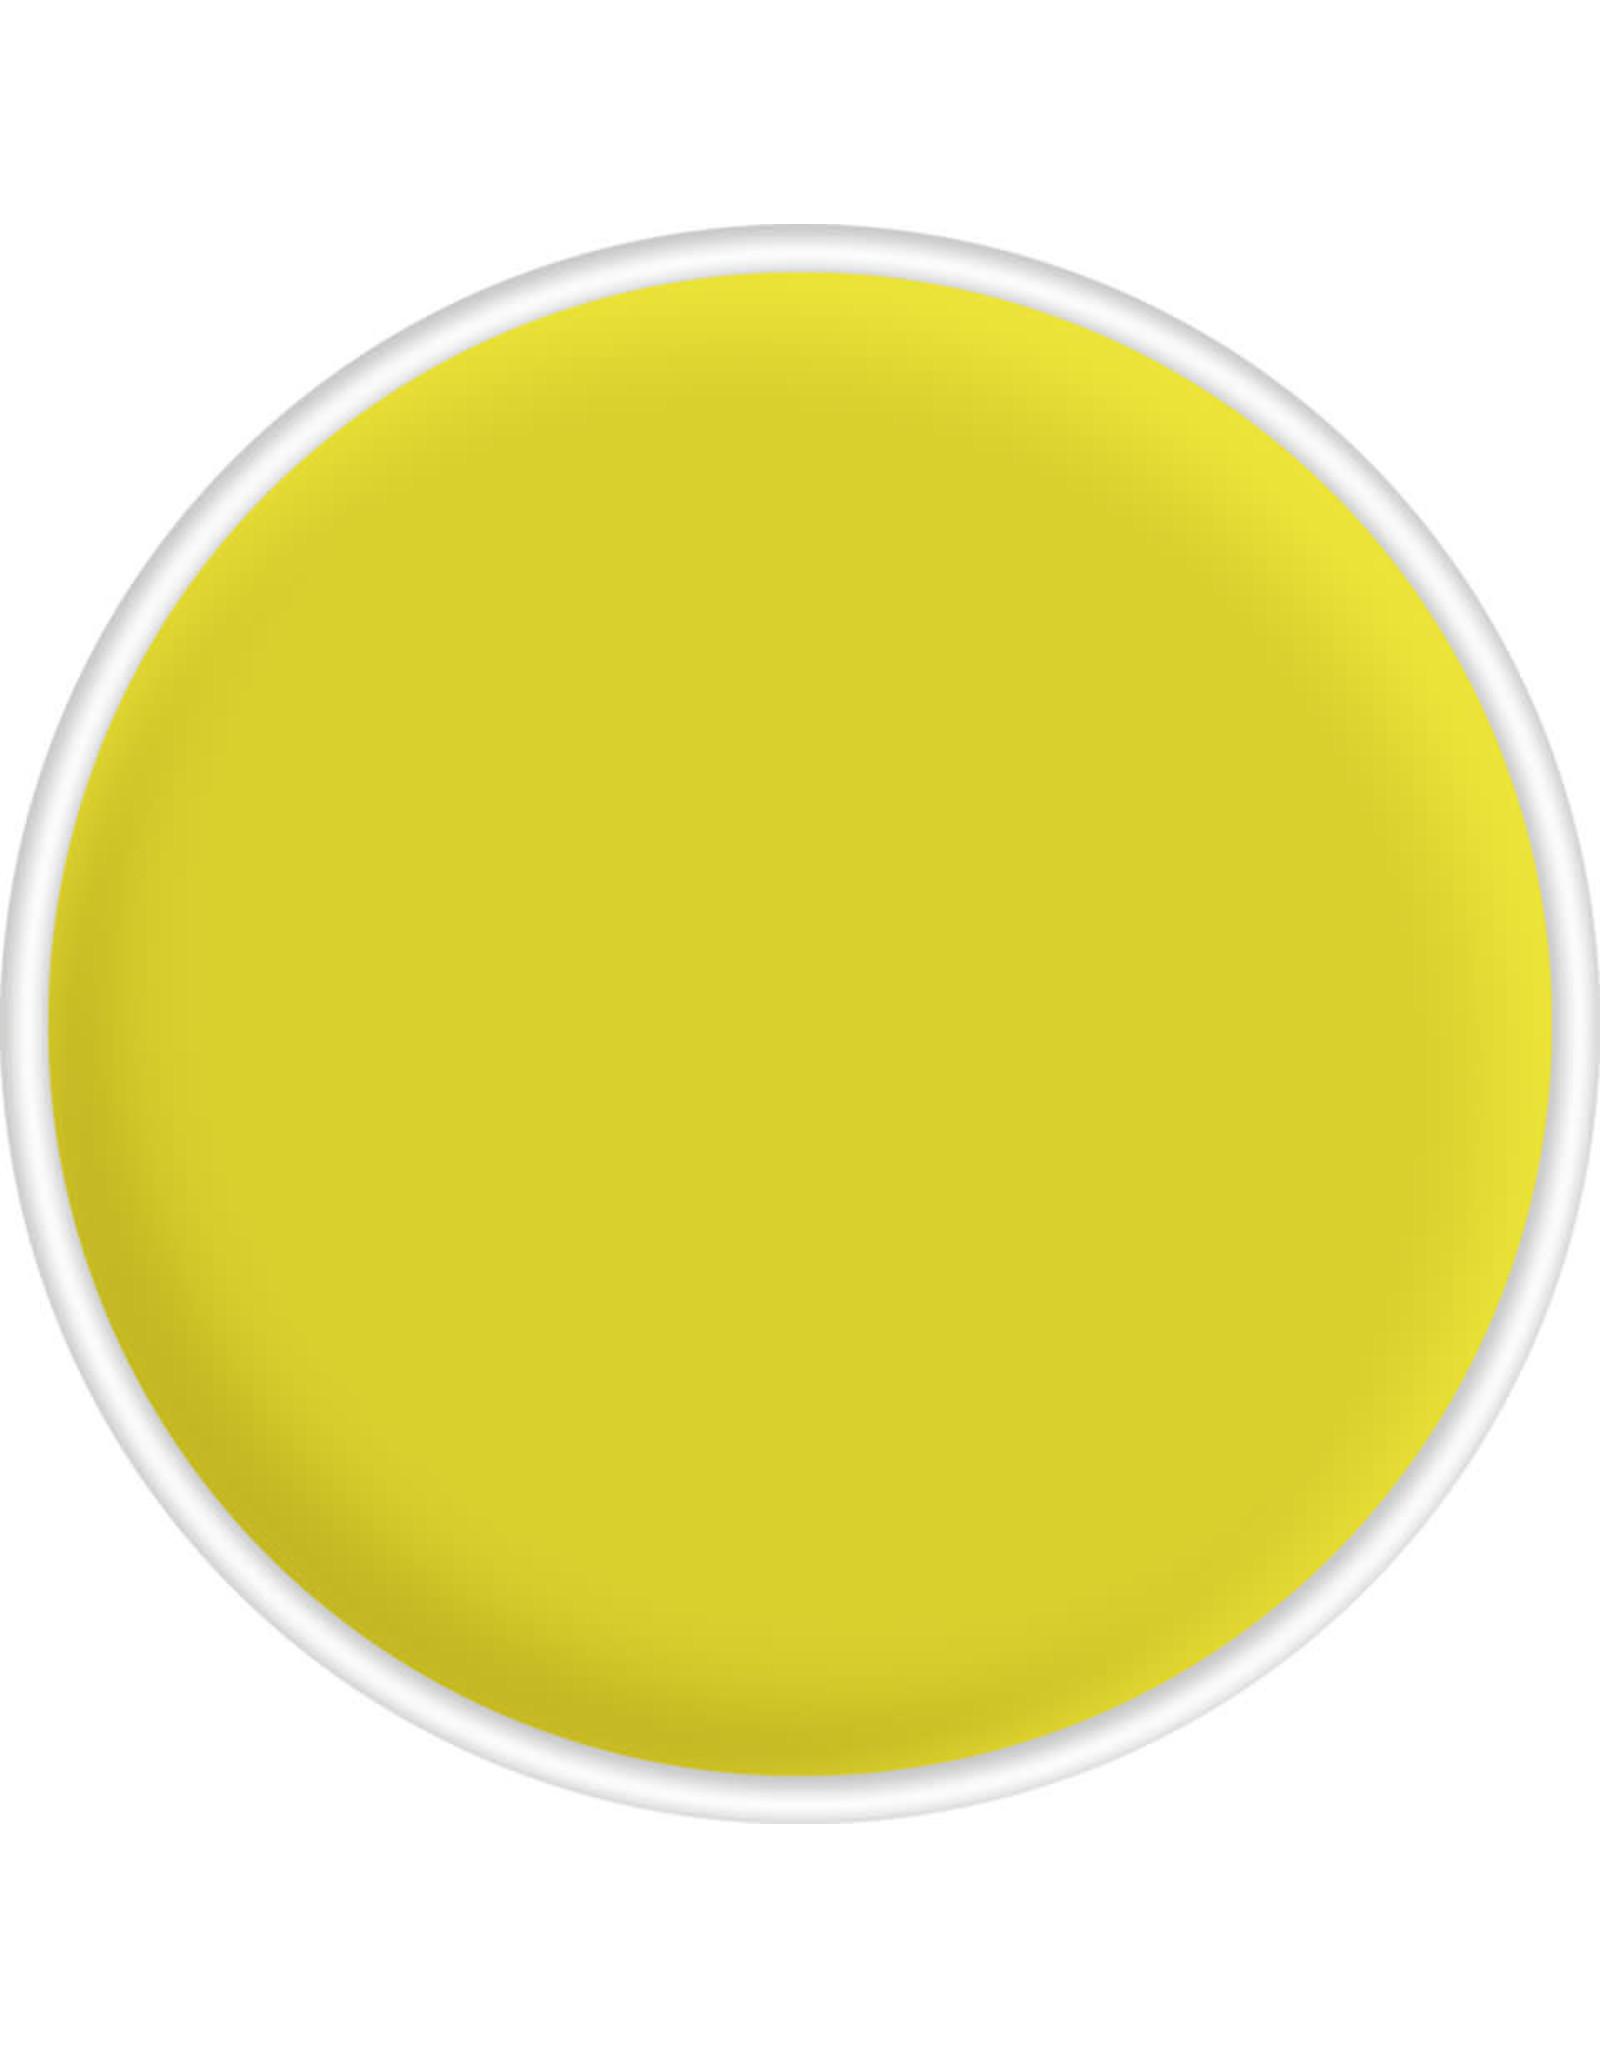 Kryolan Kryolan Aquacolor - UV-Dayglow - 4ml refill size